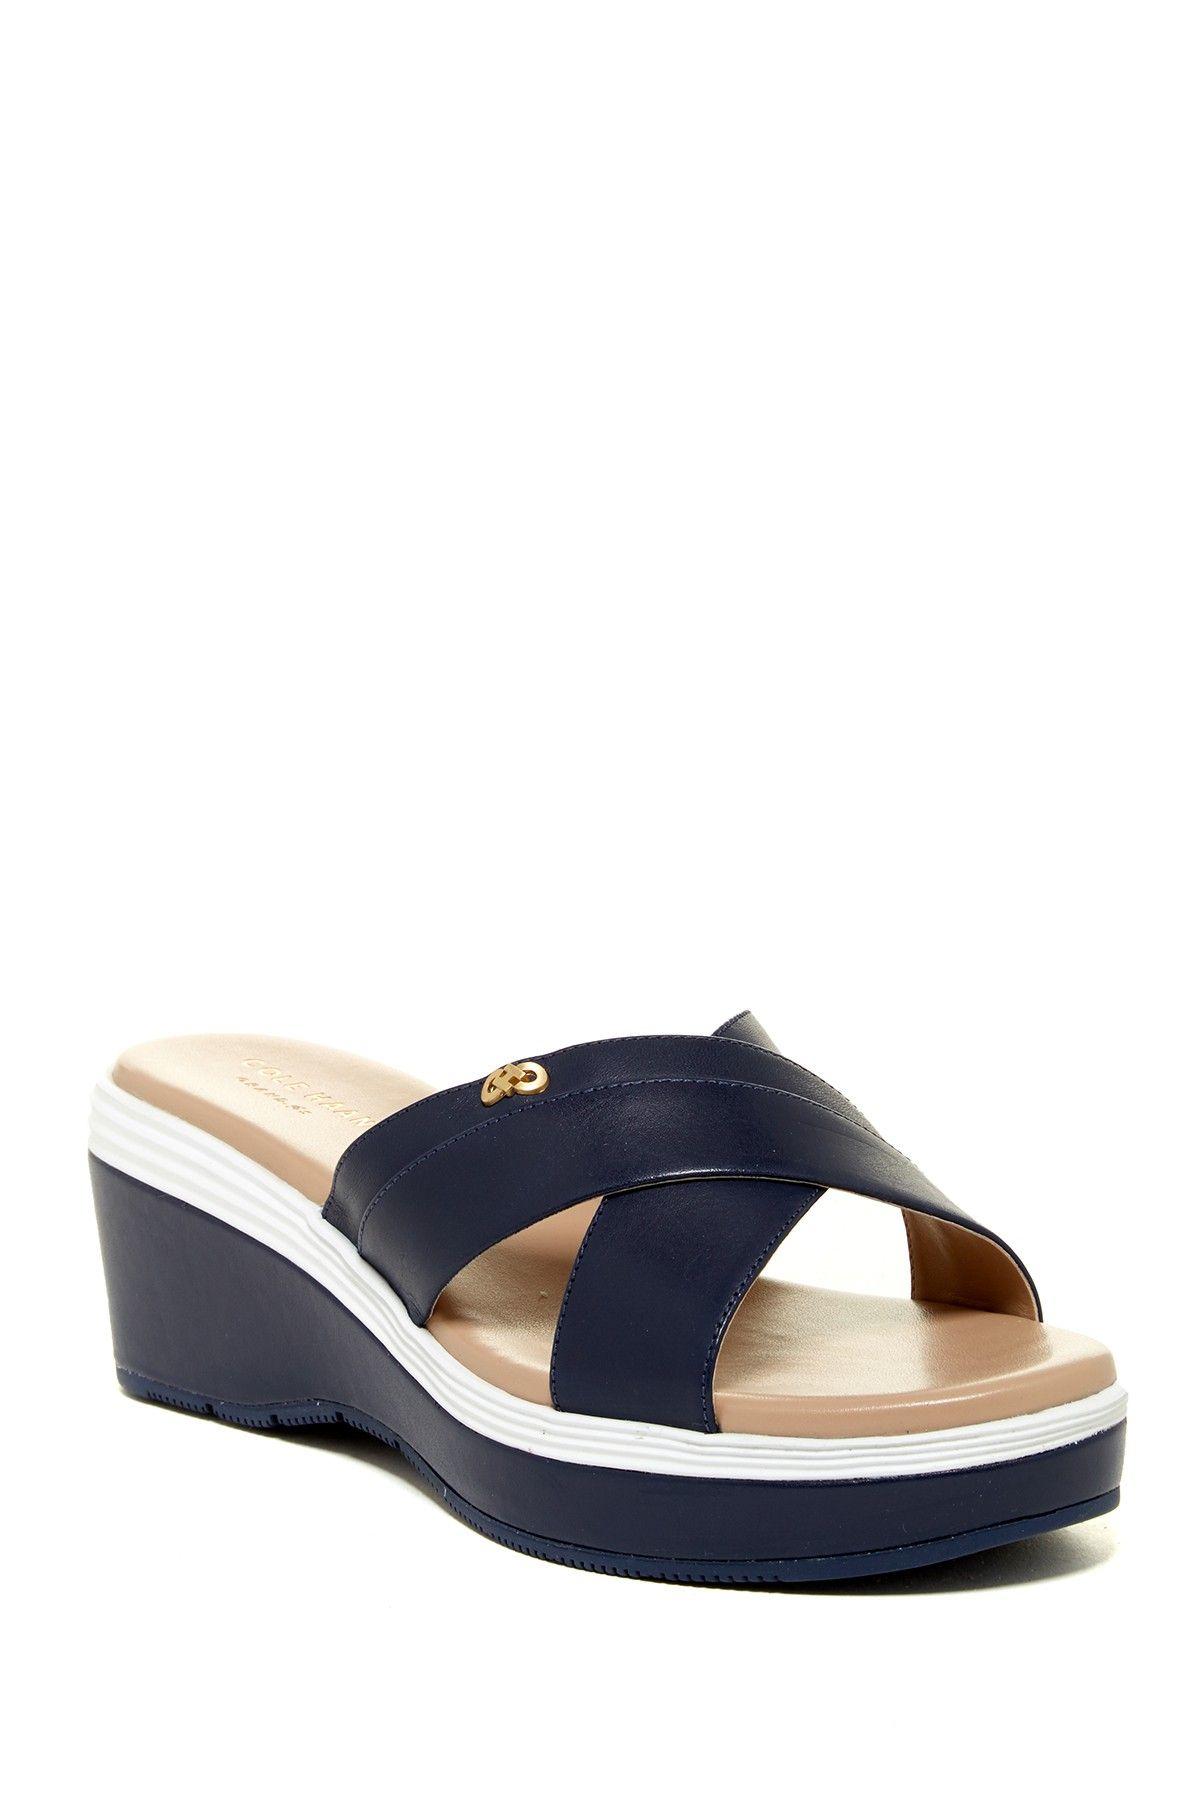 51046568e75 Briella Grand II Wedge Sandal Designer Shoes